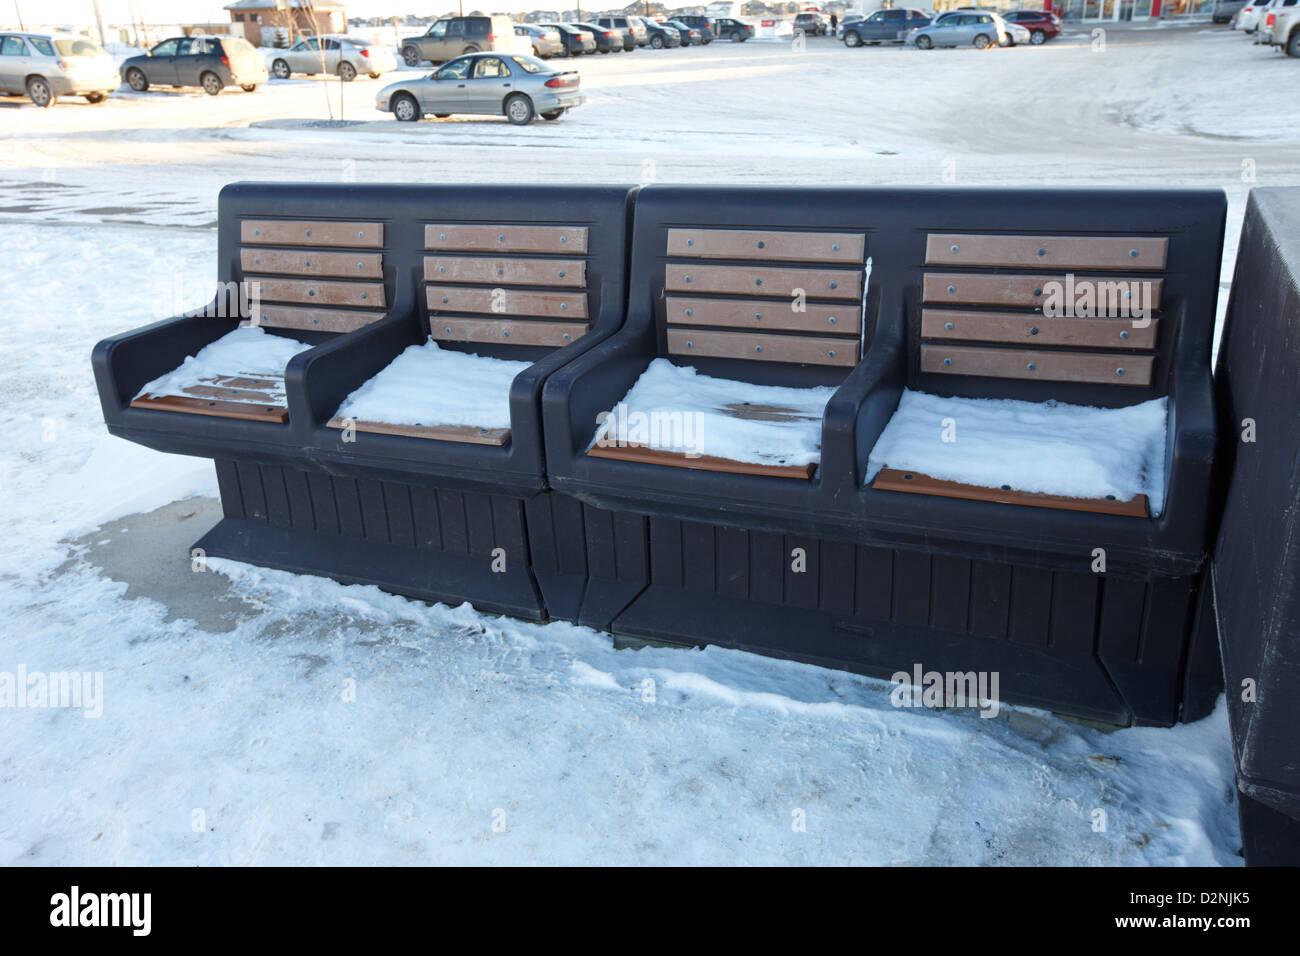 Tags Furniture Stores Furniture Saskatoon Stock Photo Outdoor Bus Stop Seats Covered With Snow Saskatoon